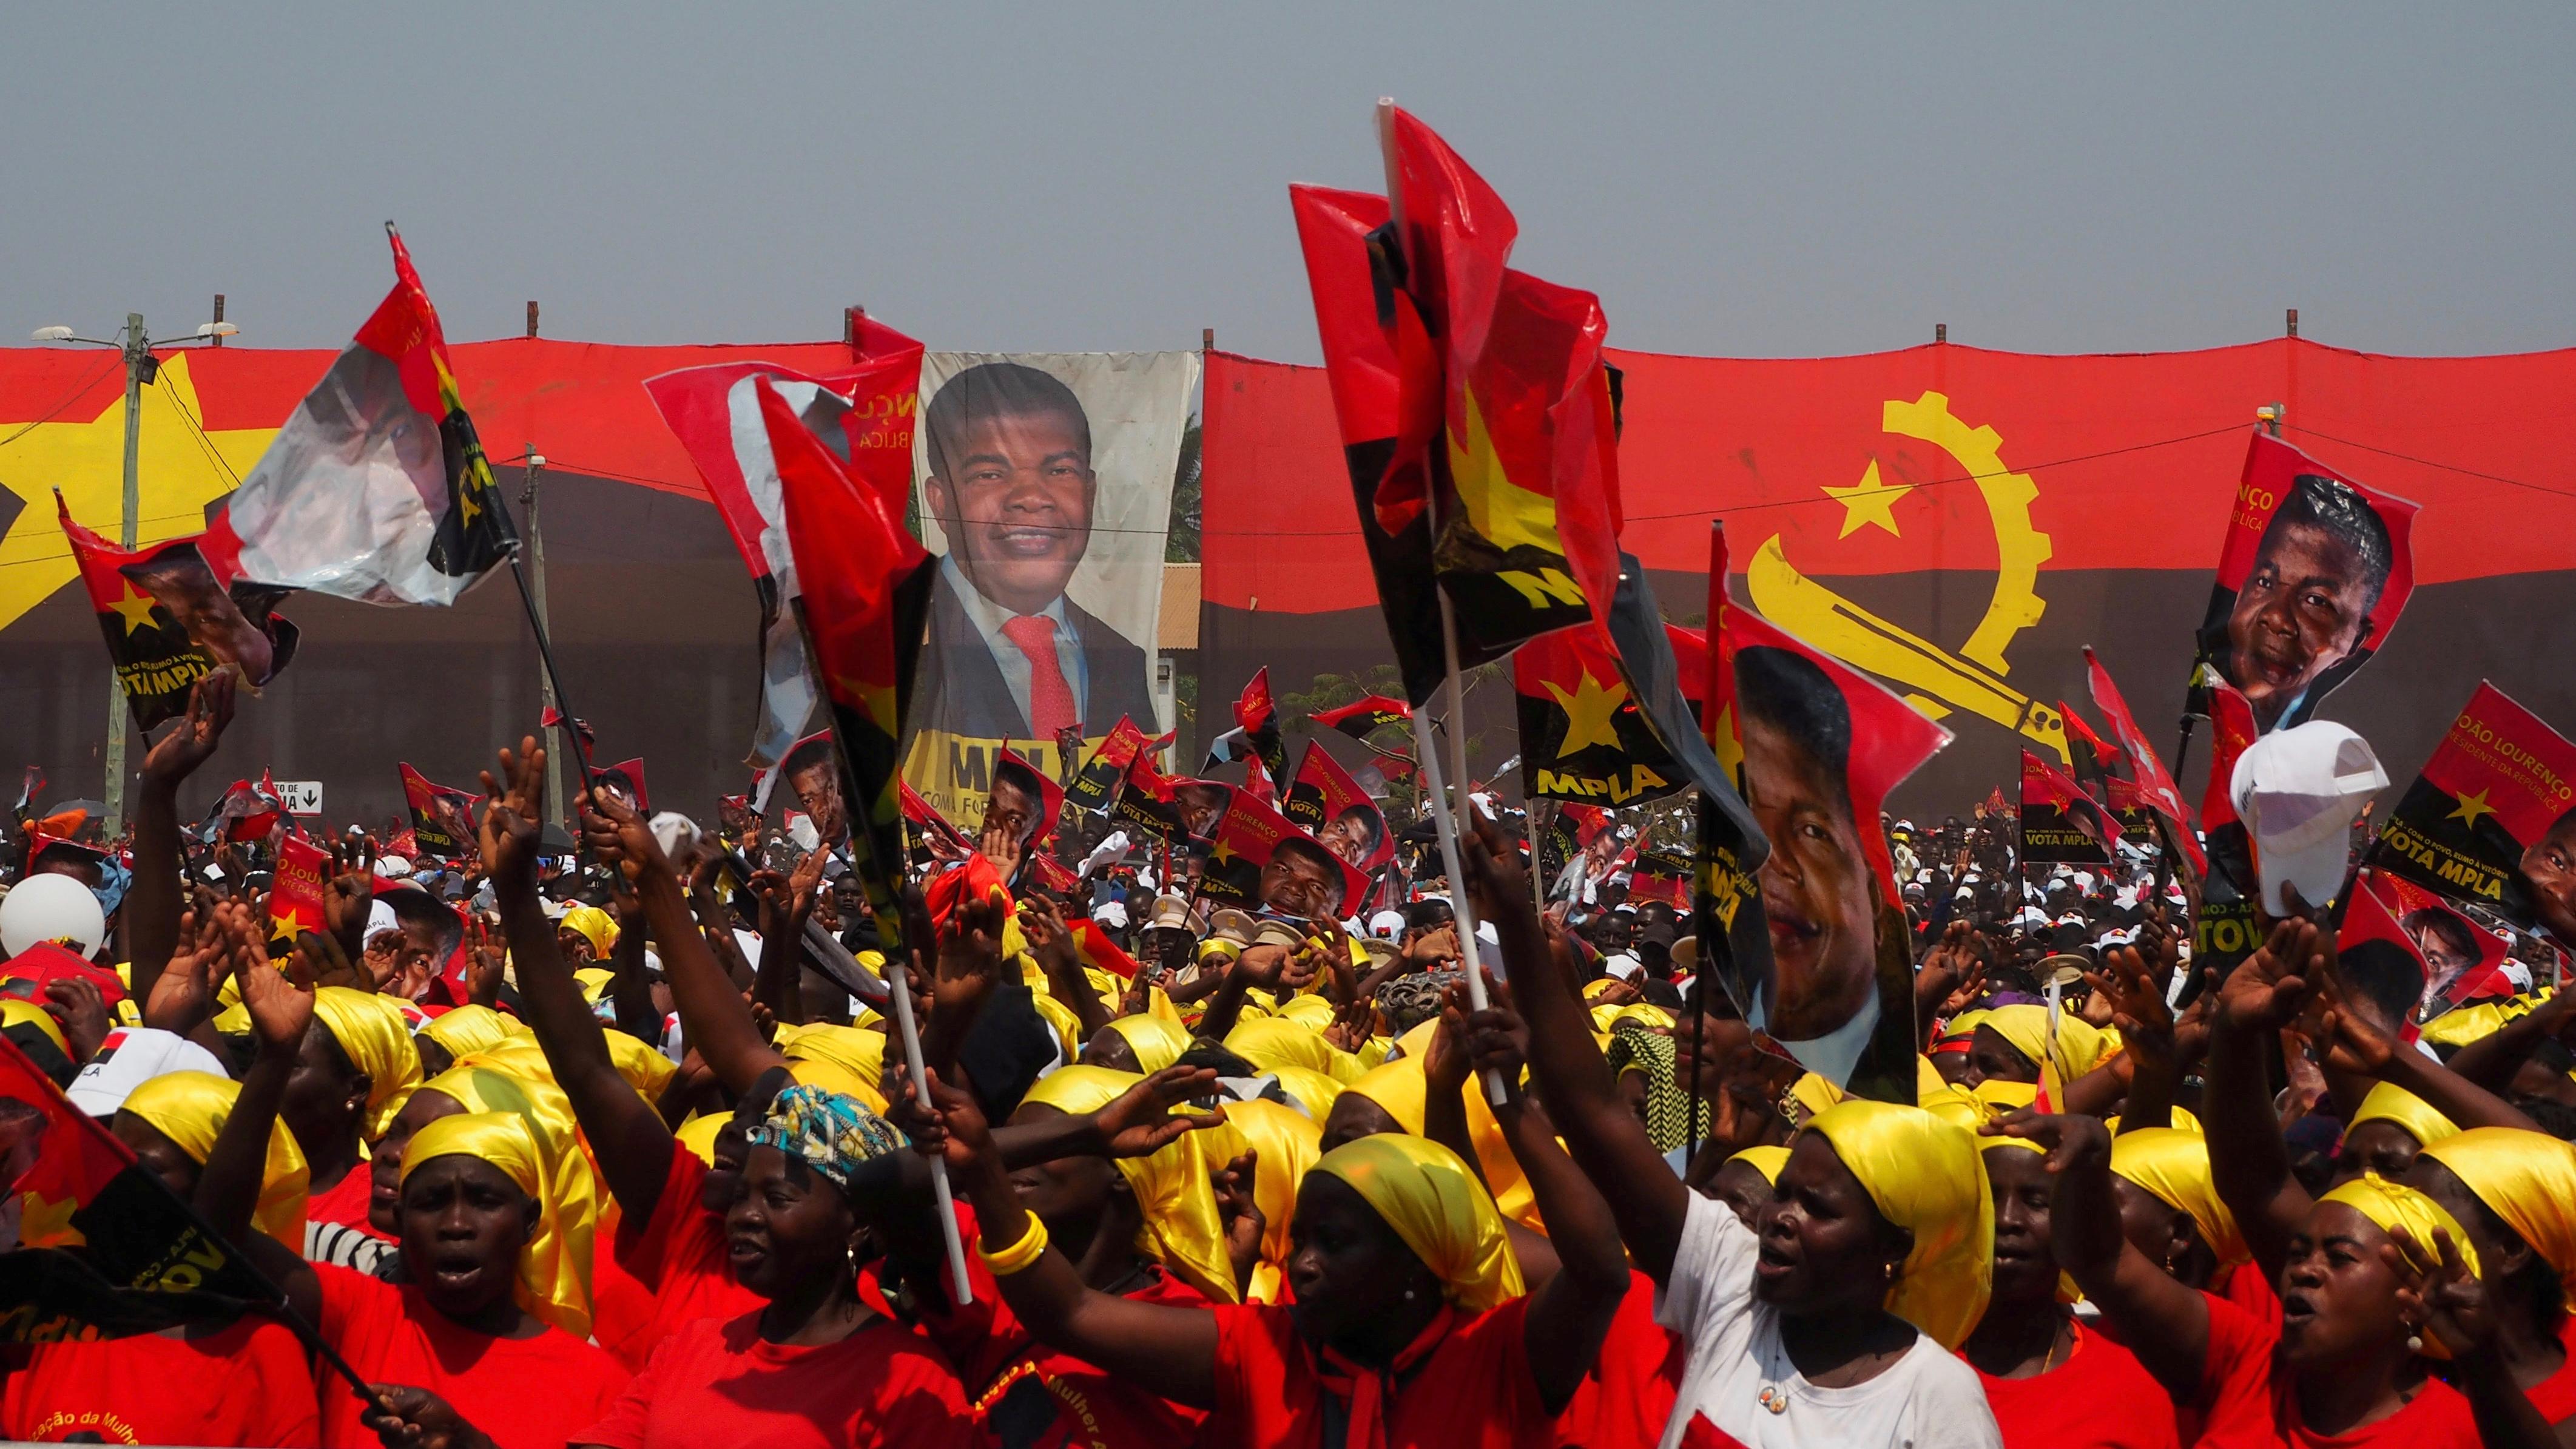 Angola elections: Who is Angola's new president Joao Lourenco?